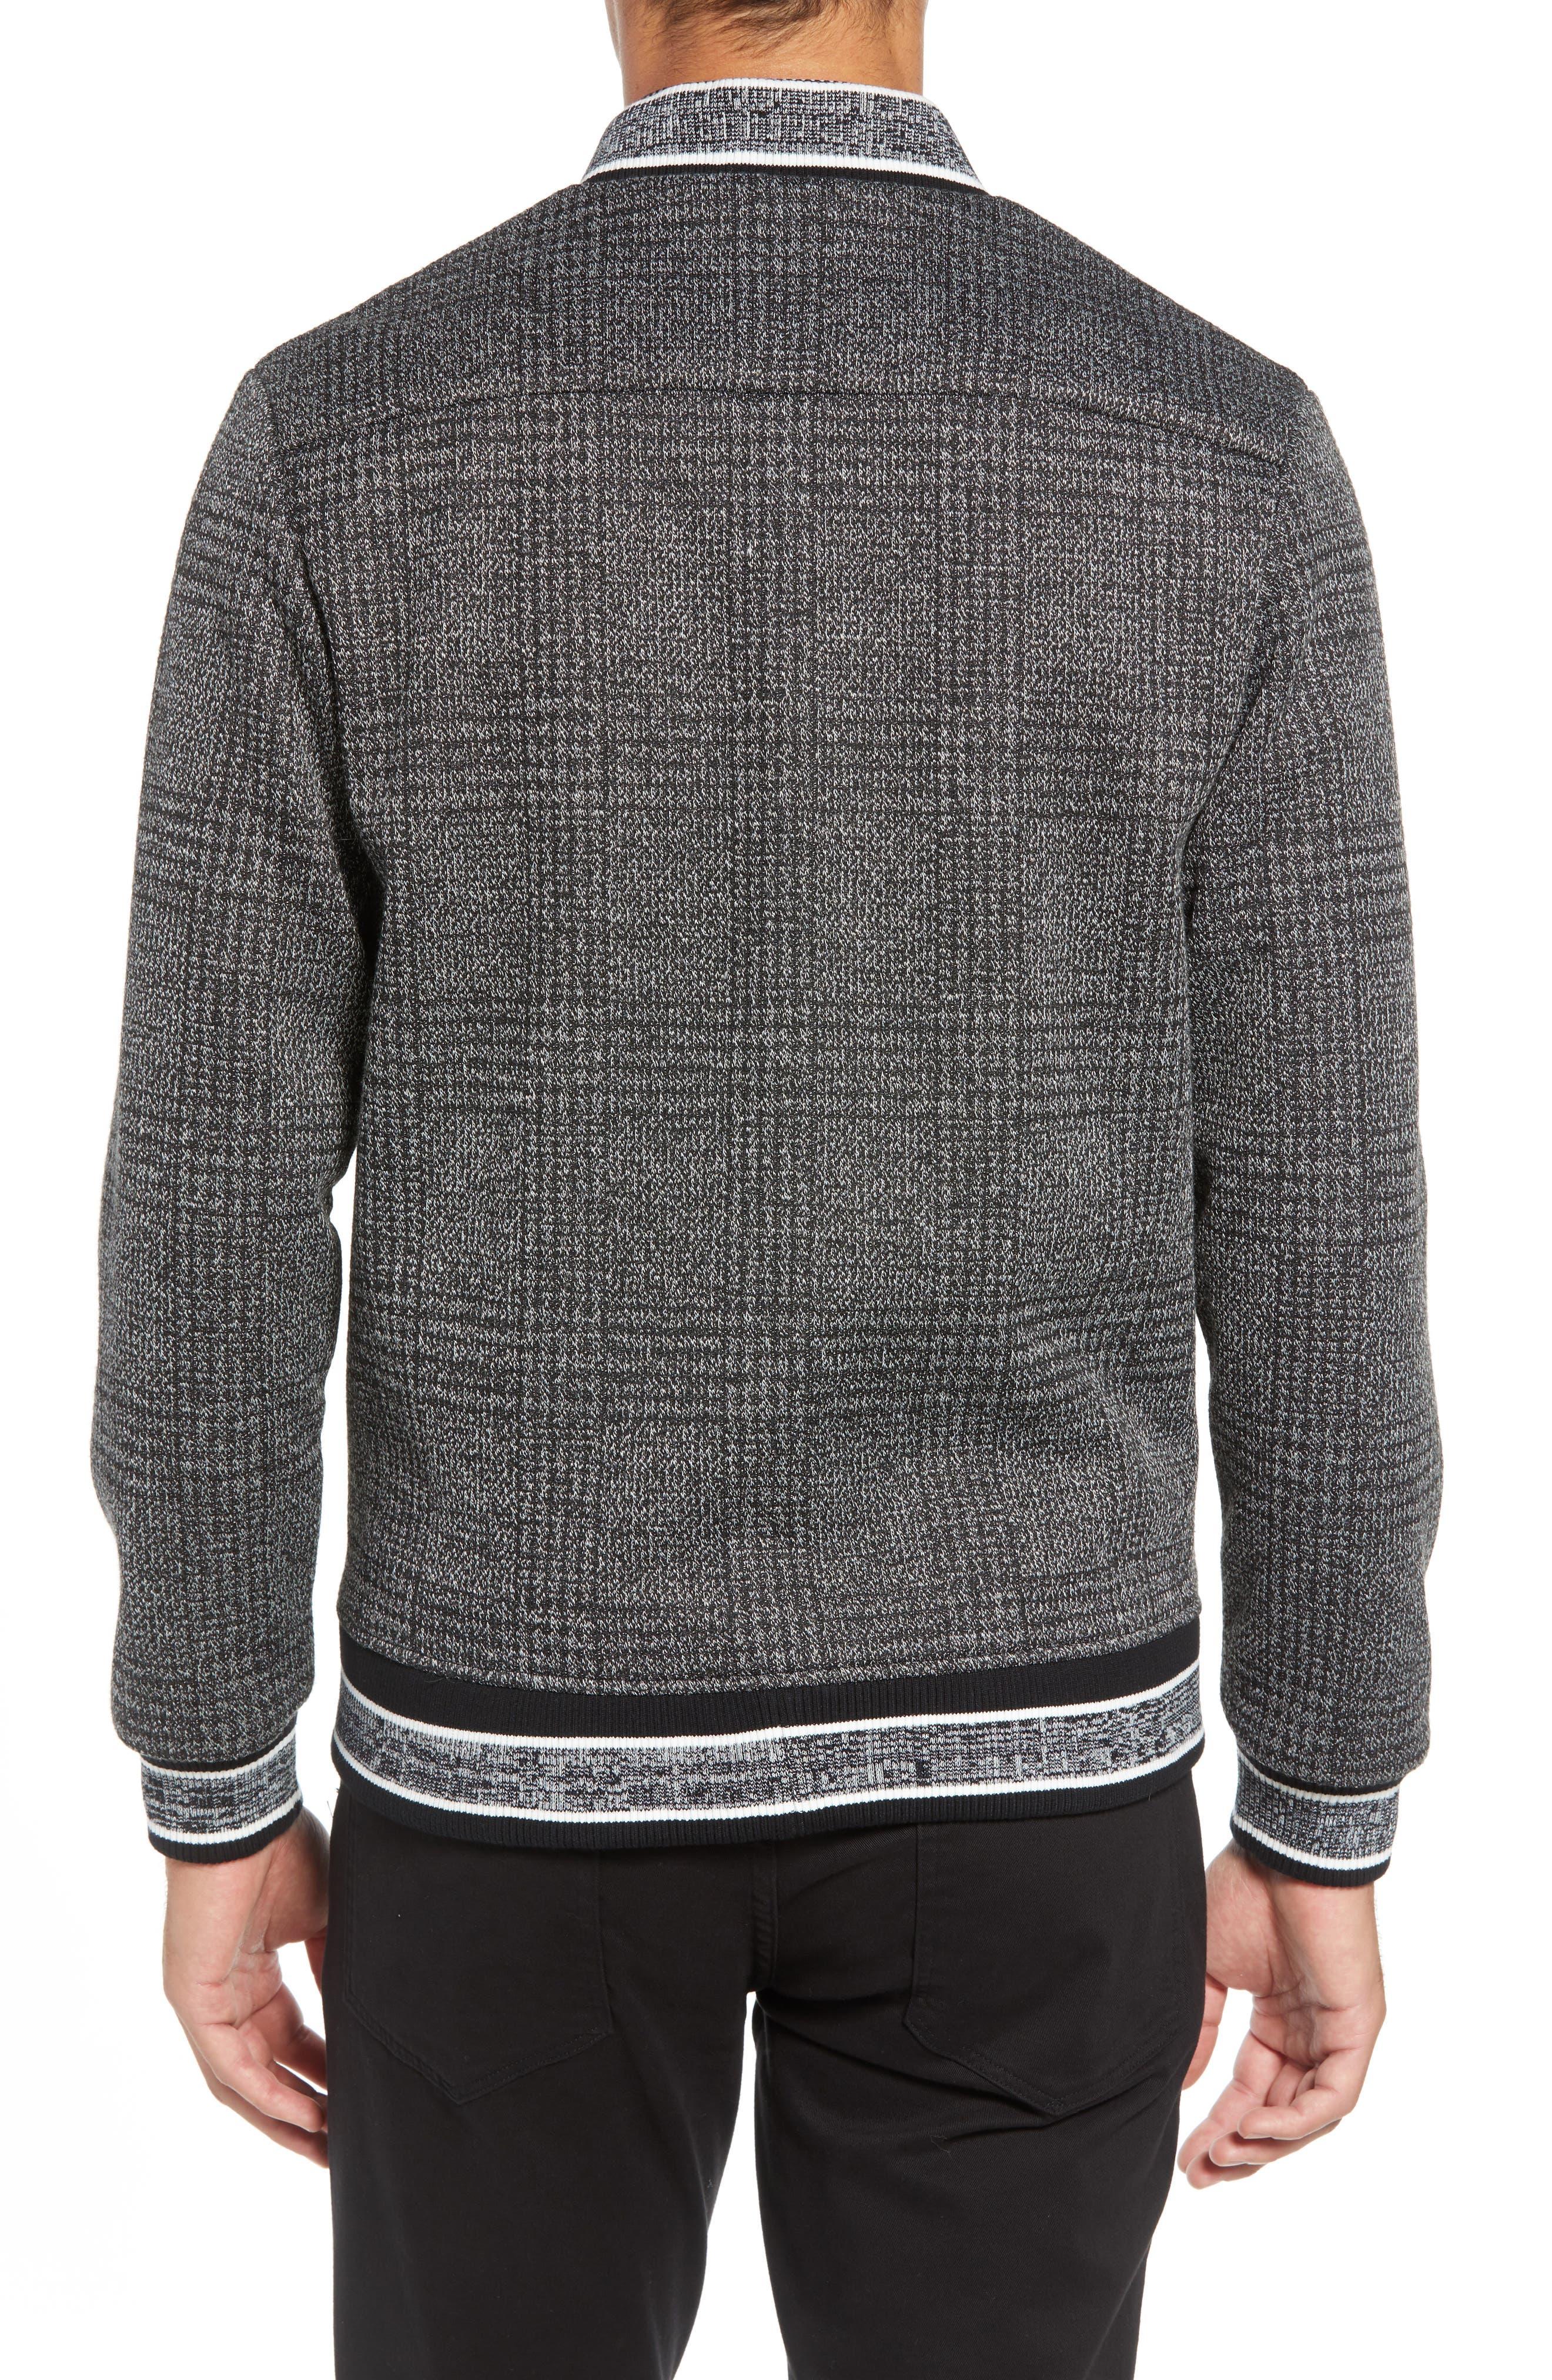 Slim Fit Plaid Knit Bomber Jacket,                             Alternate thumbnail 2, color,                             CHARCOAL PLAID